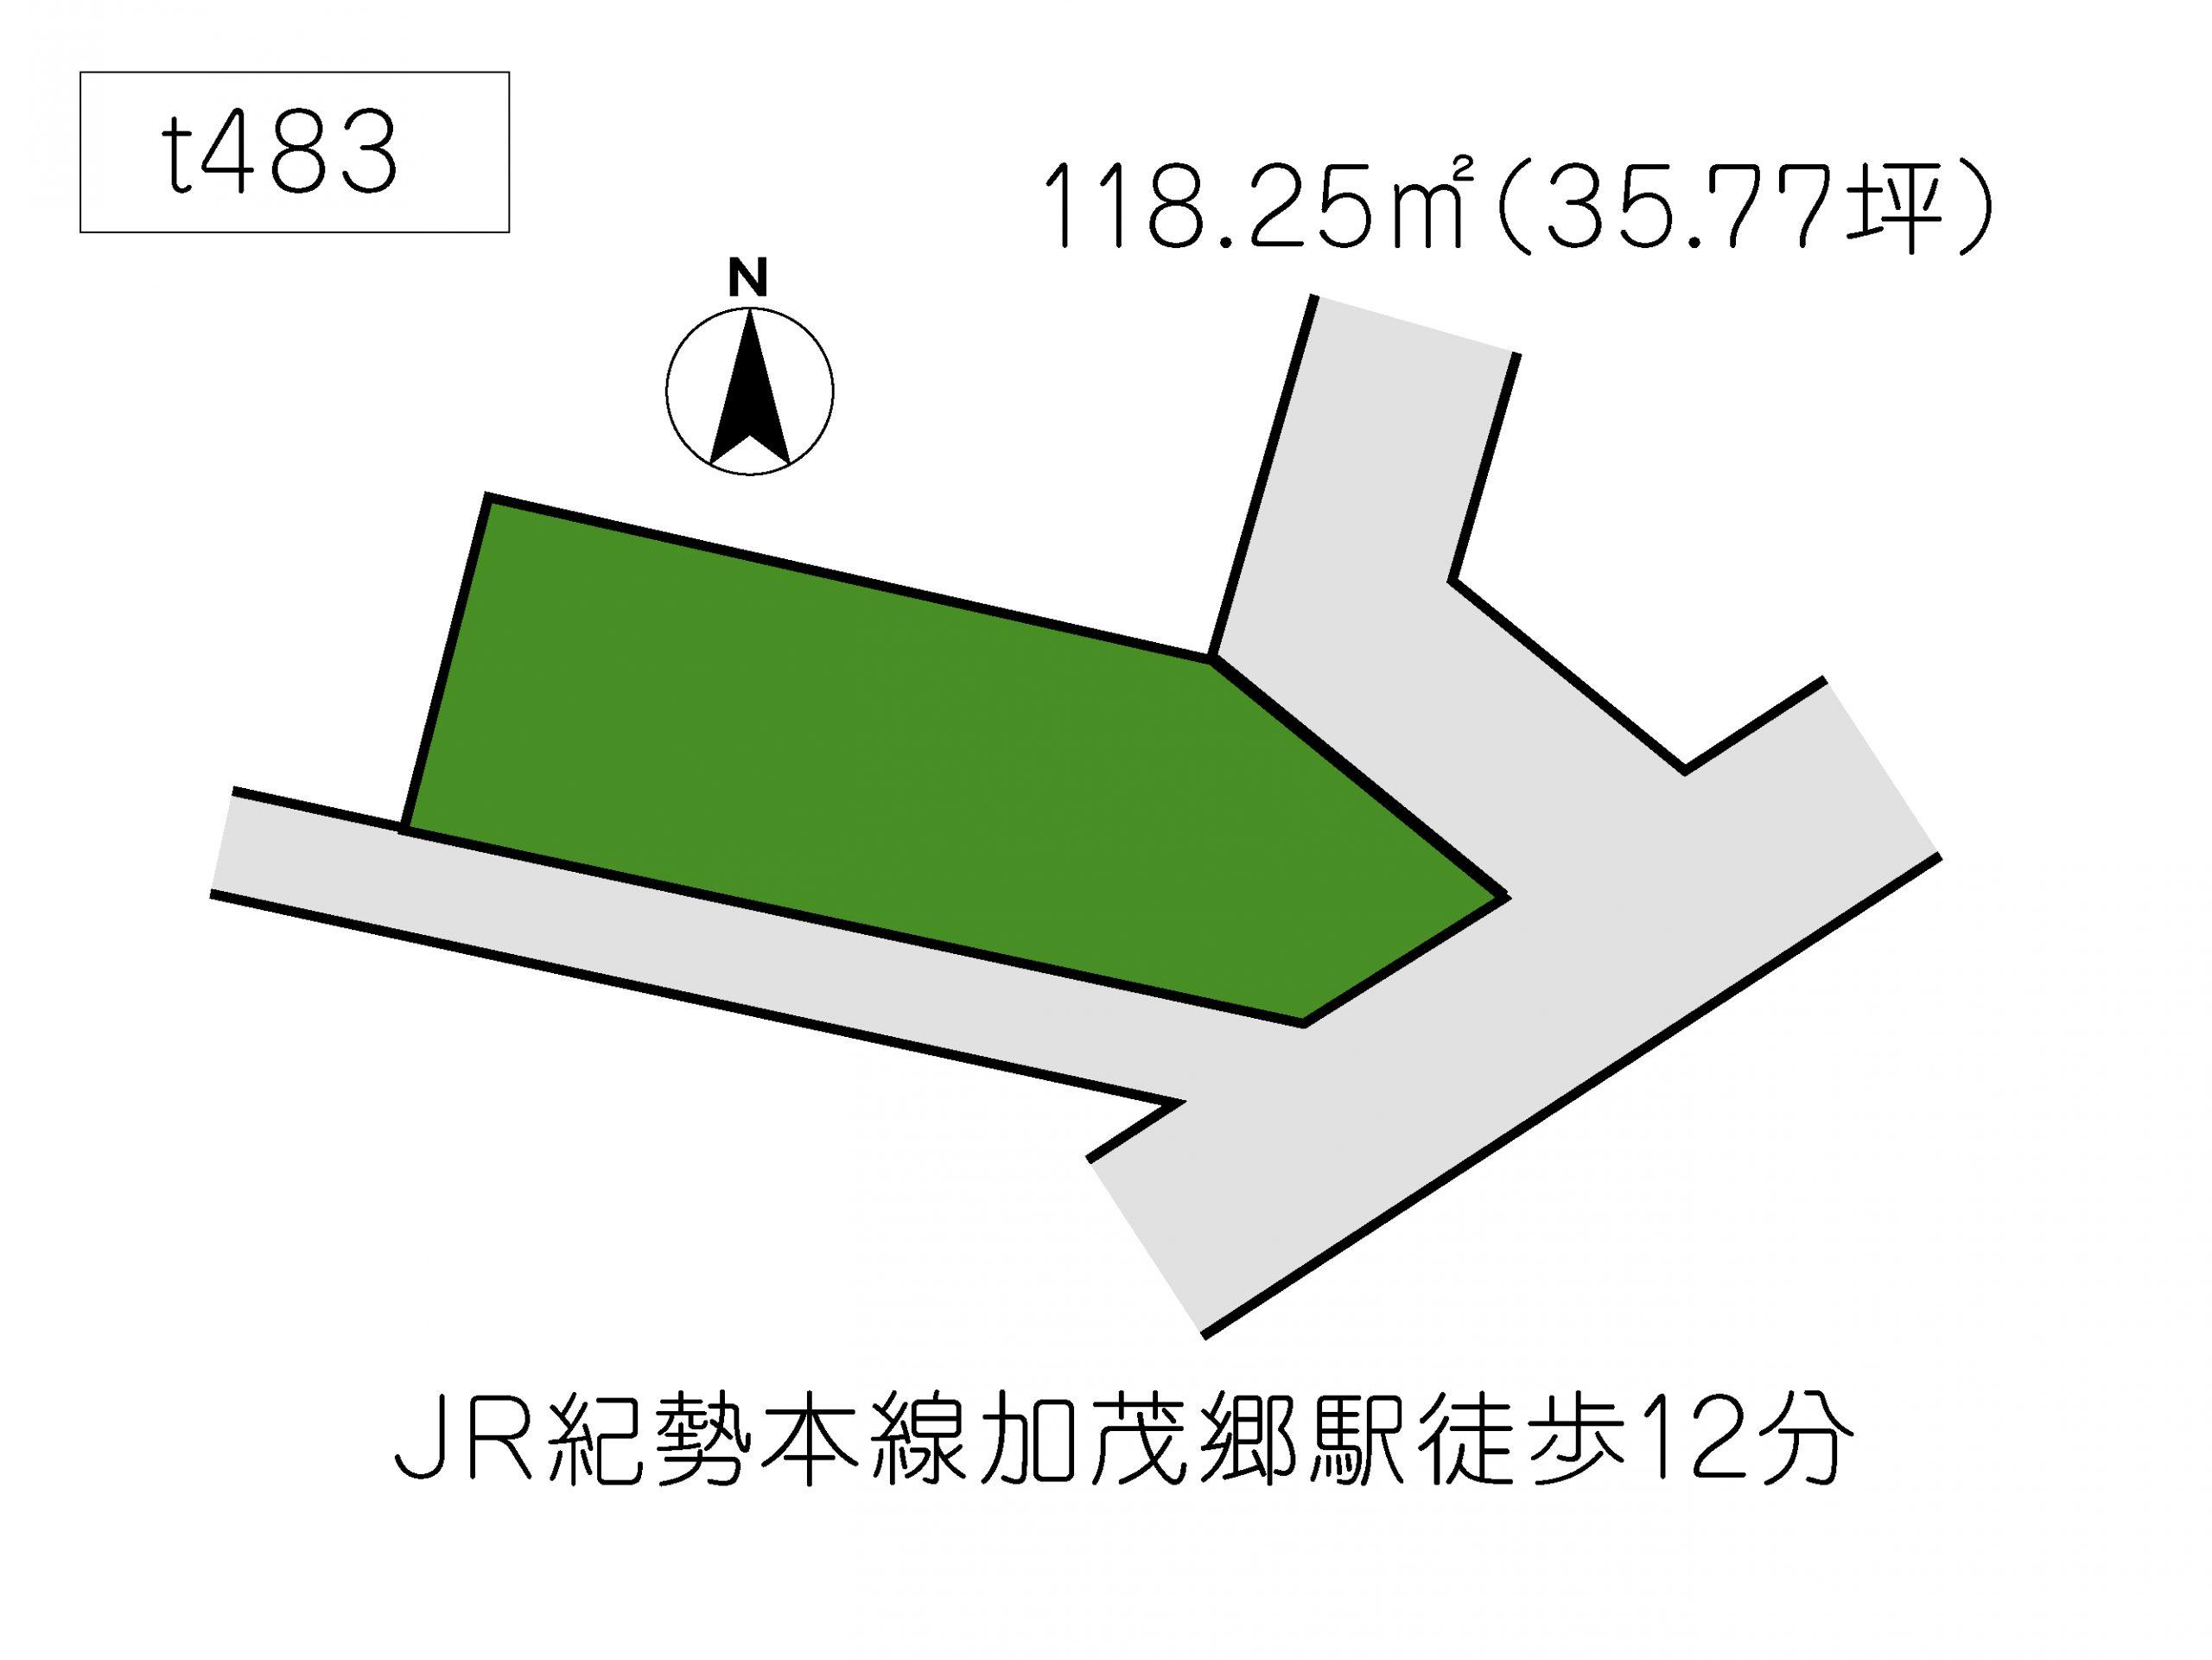 T483 海南市下津町